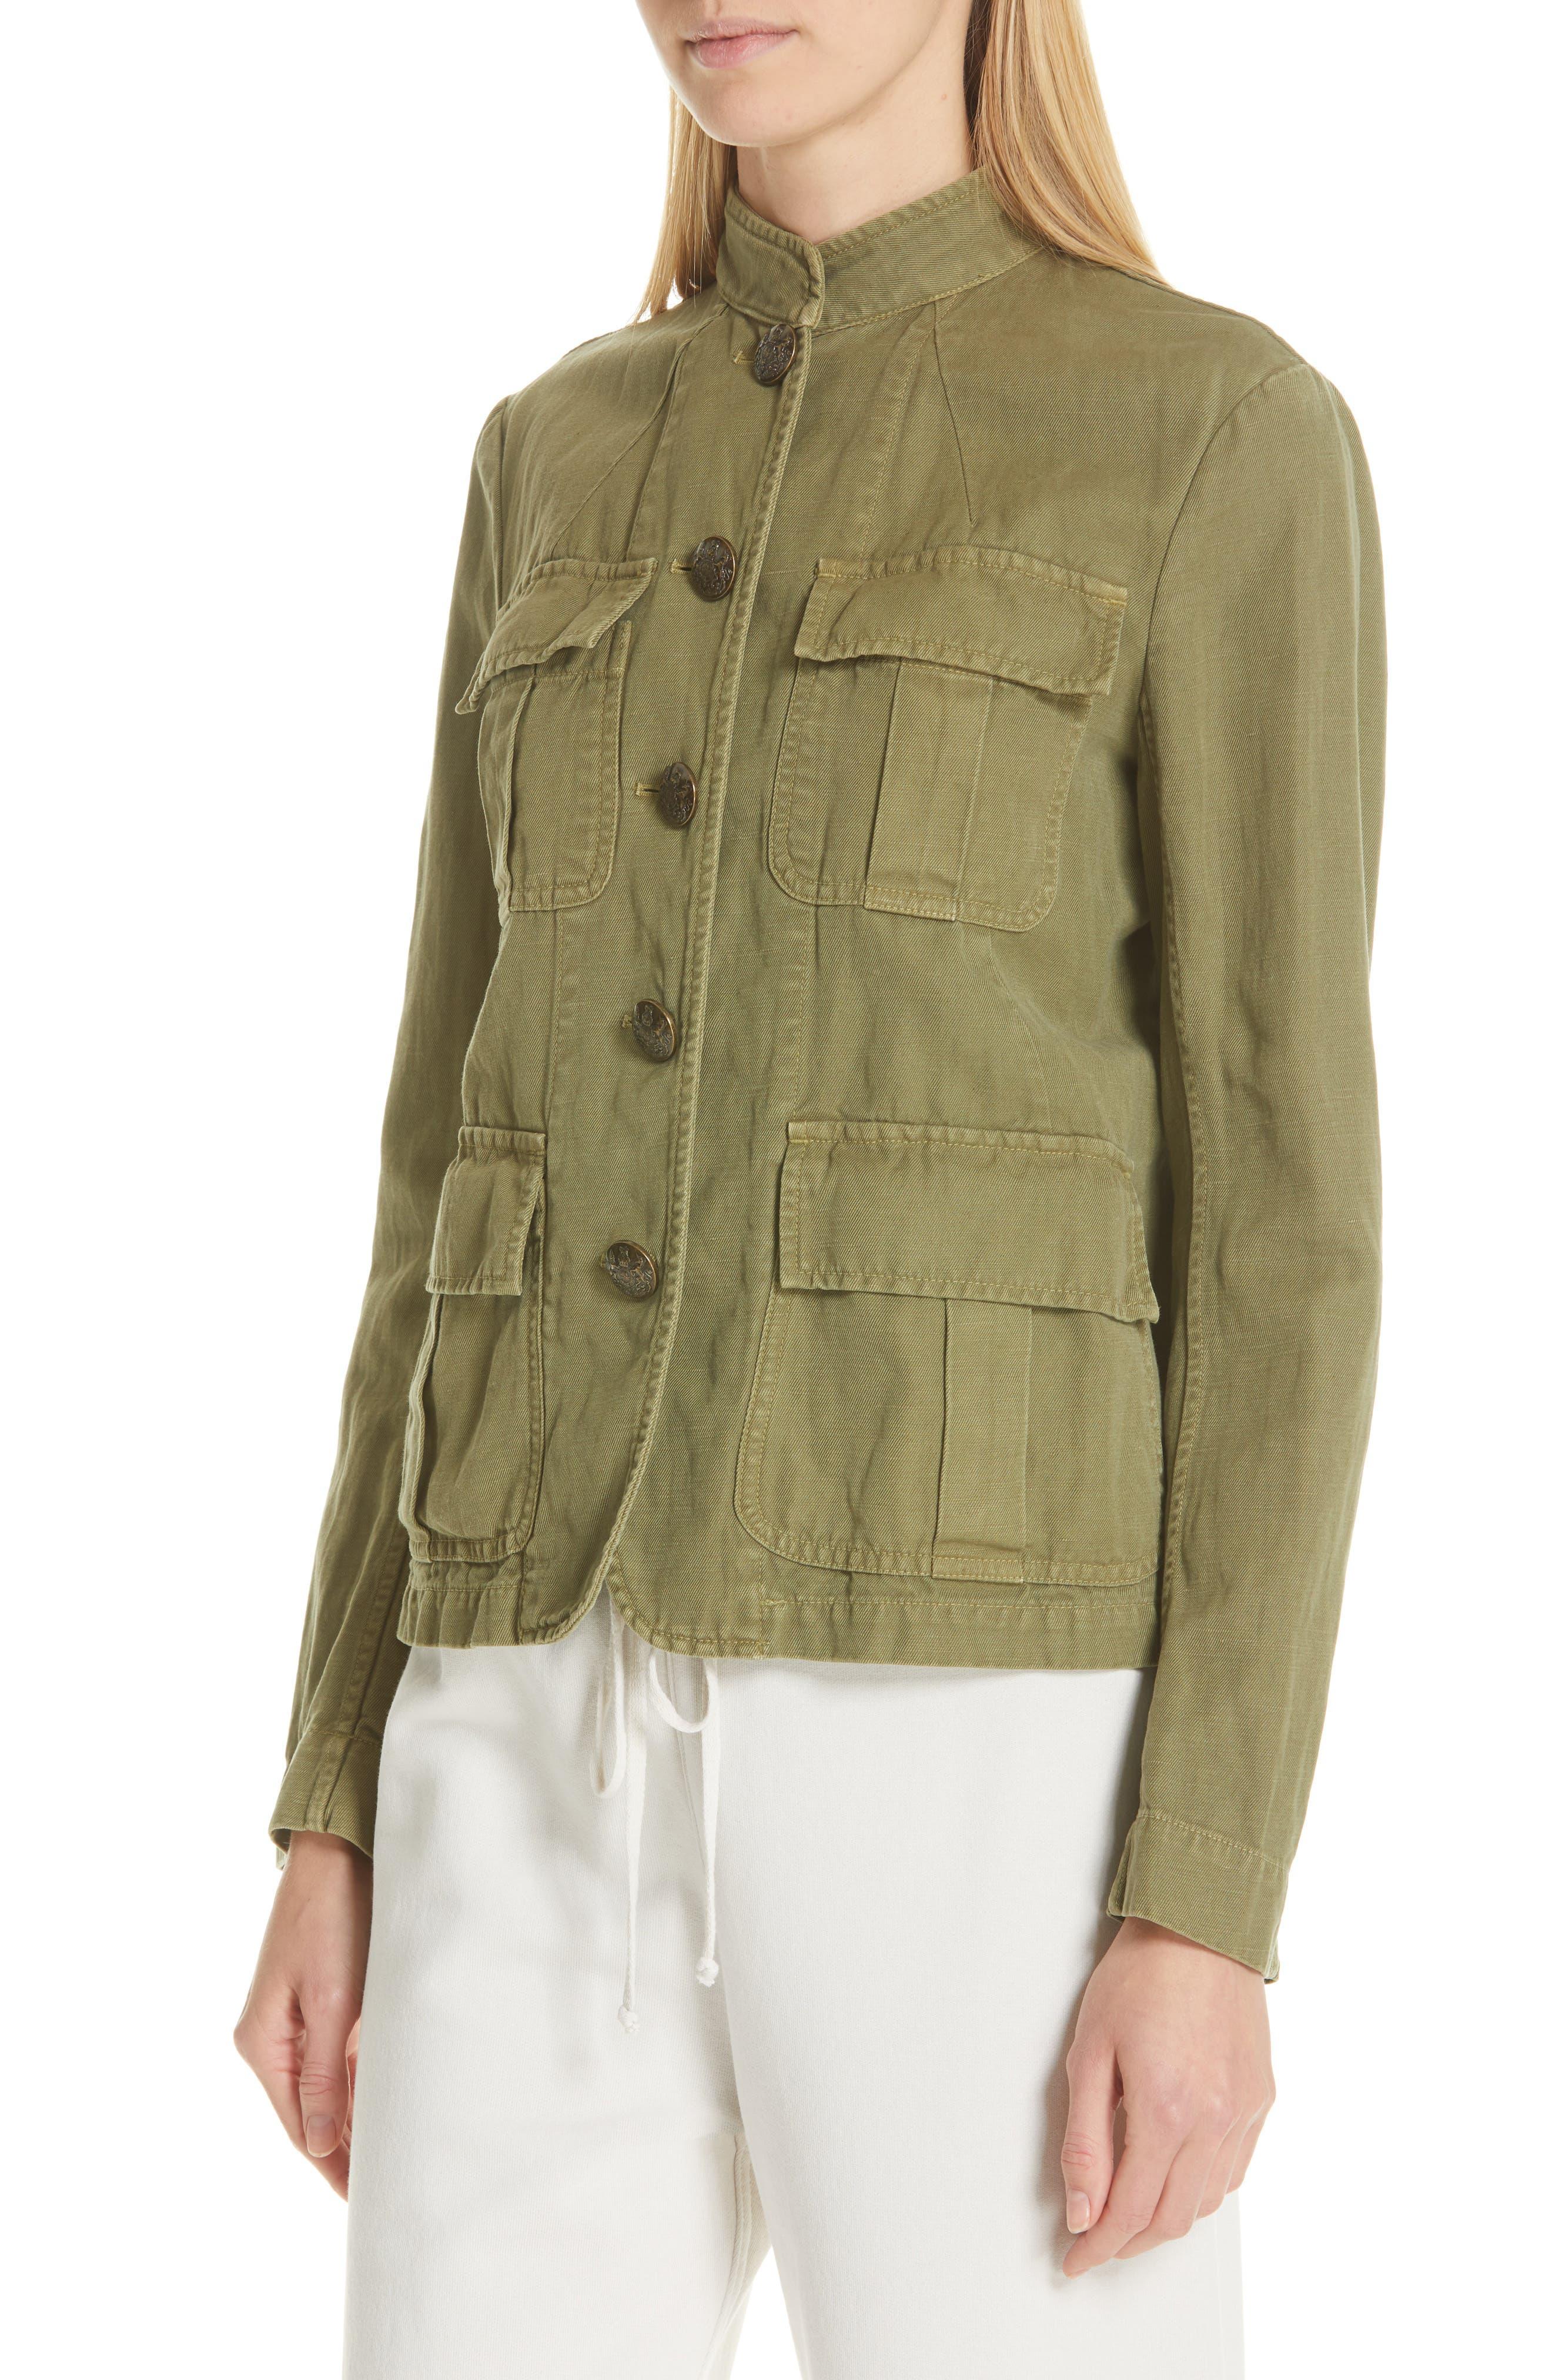 NILI LOTAN, Cambre Jacket, Alternate thumbnail 5, color, UNIFORM GREEN